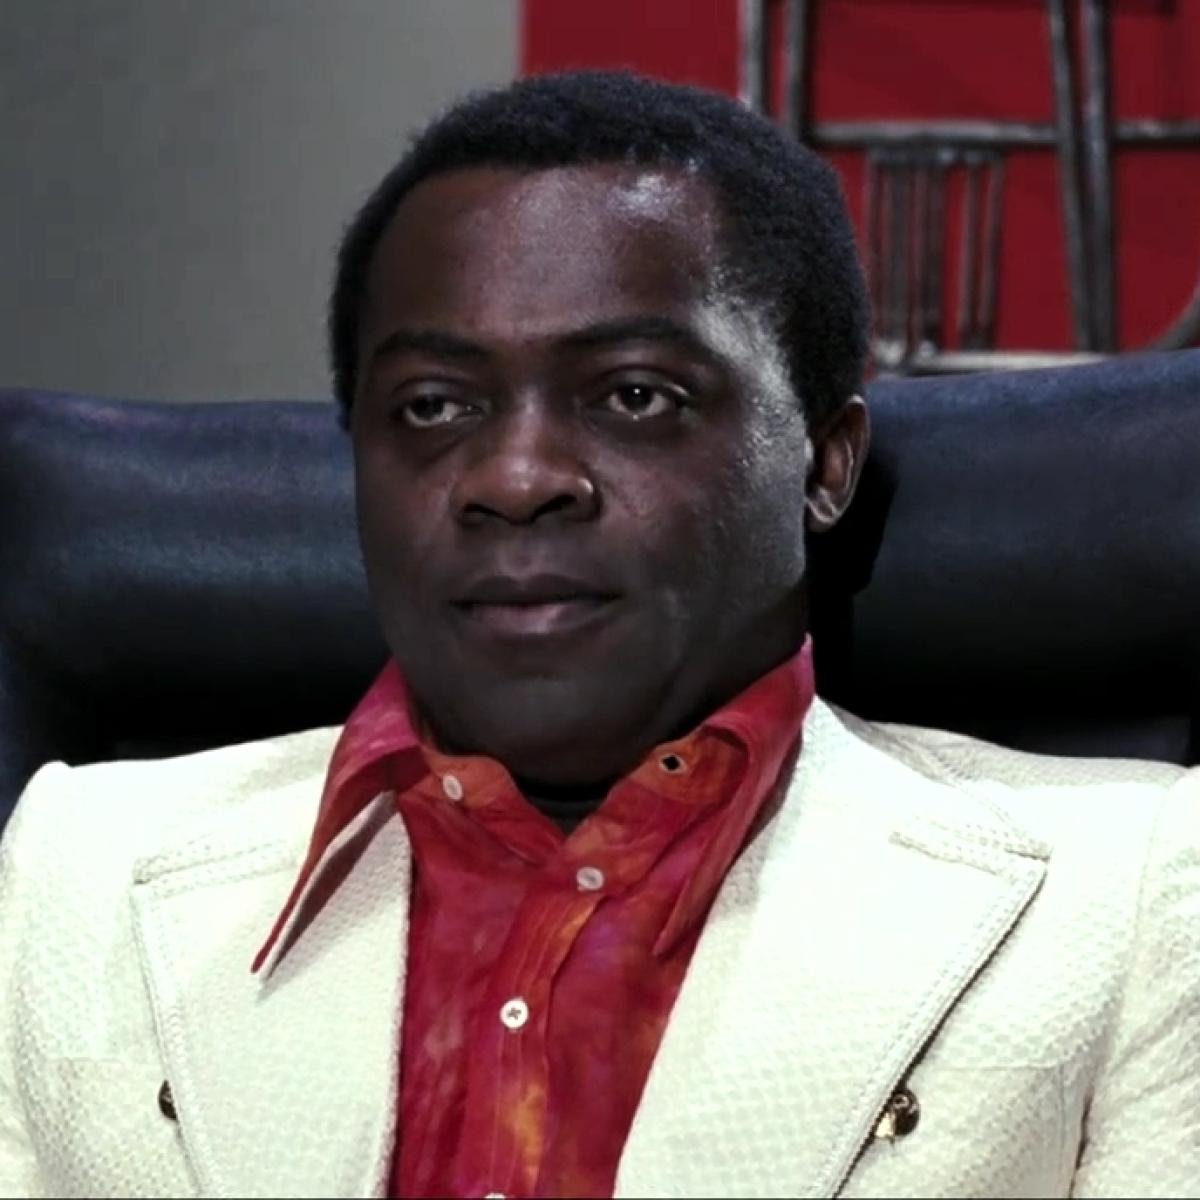 James Bond villain Yaphet Kotto passes away